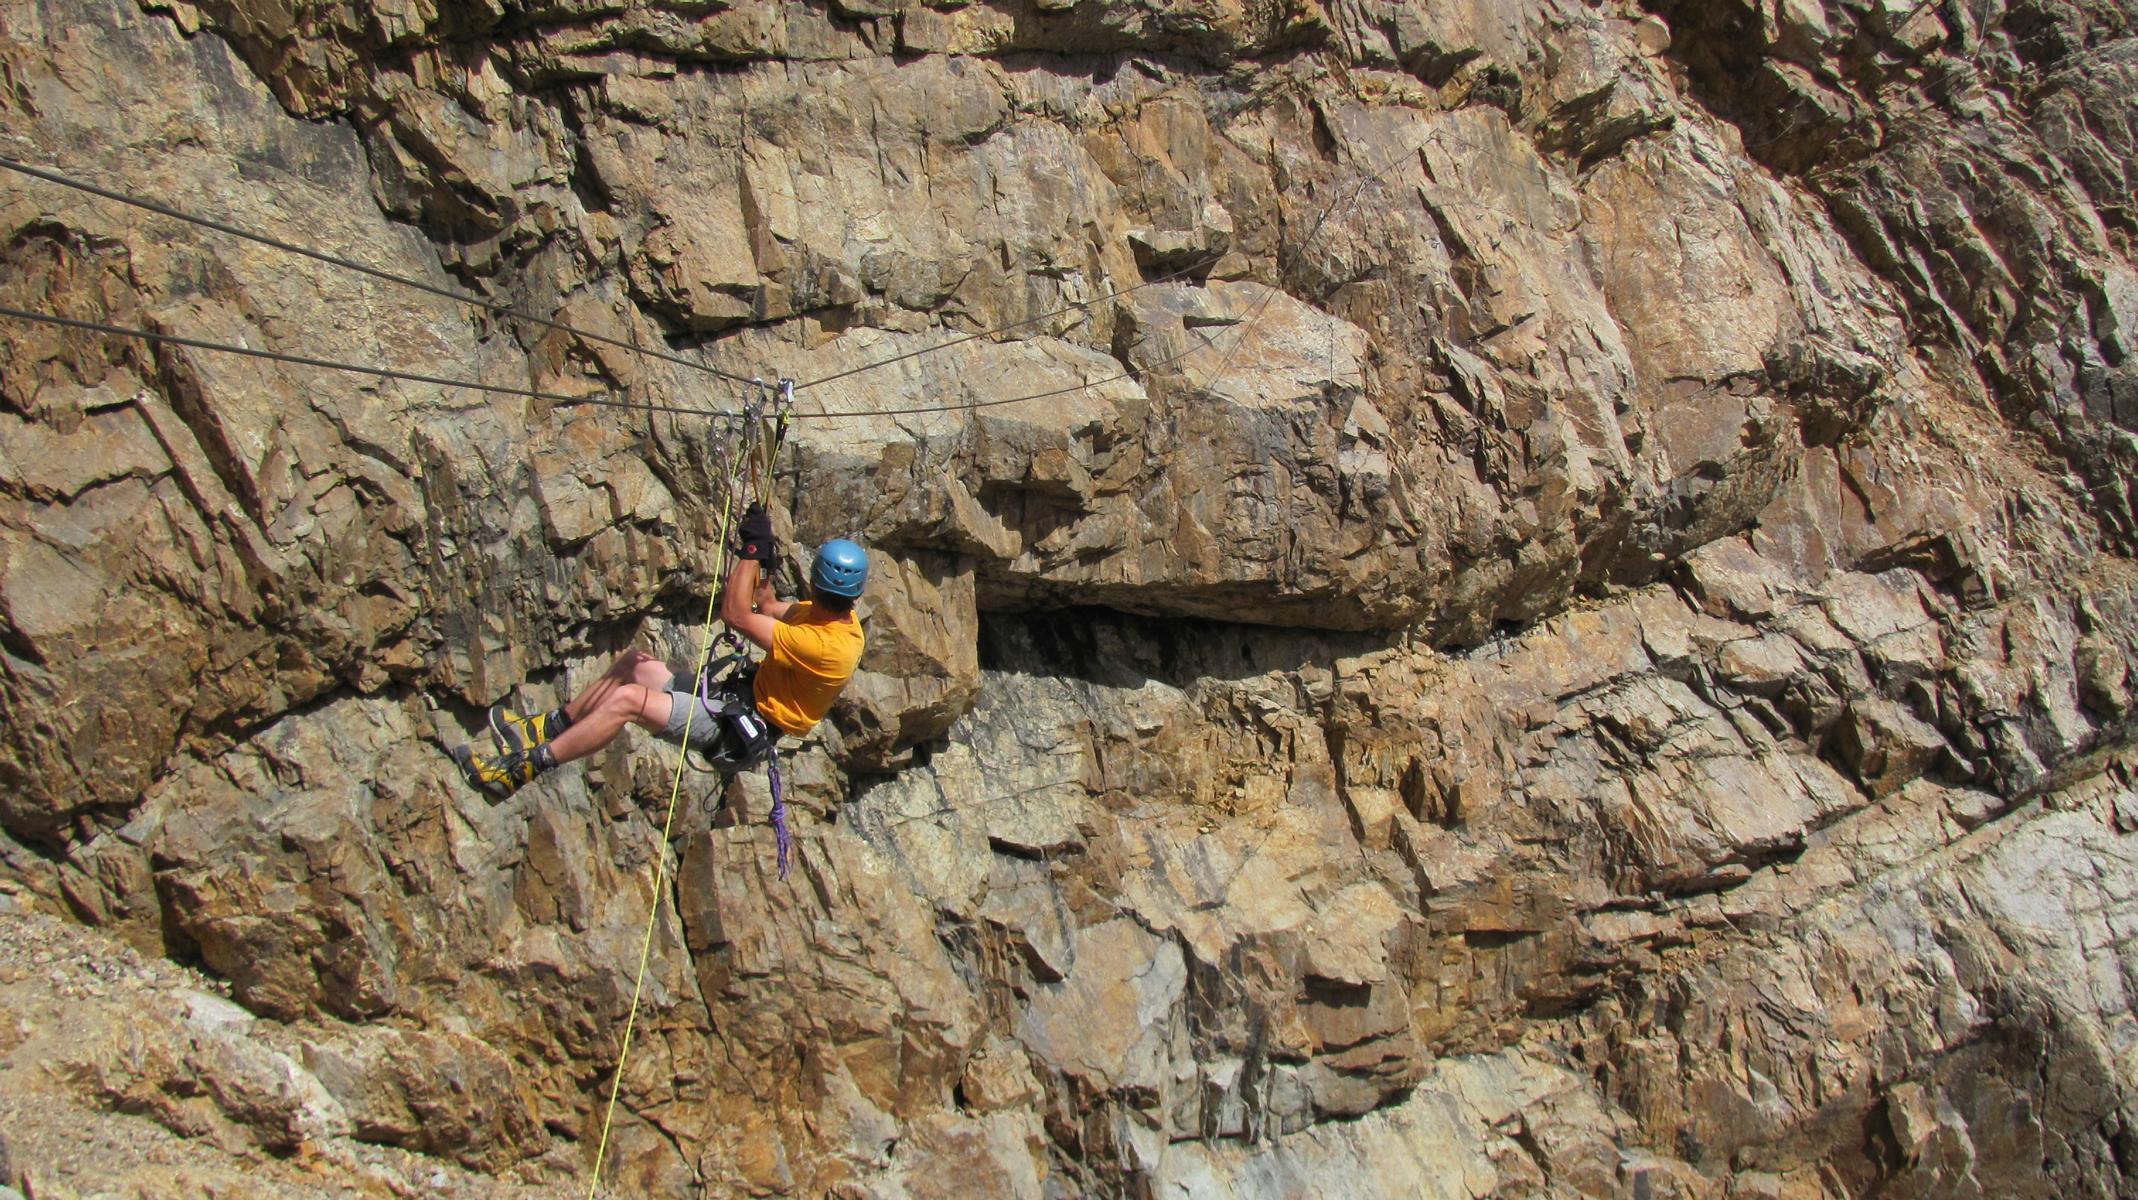 Klettersteig Piz Trovat : Piz trovat klettersteig bergsteigen